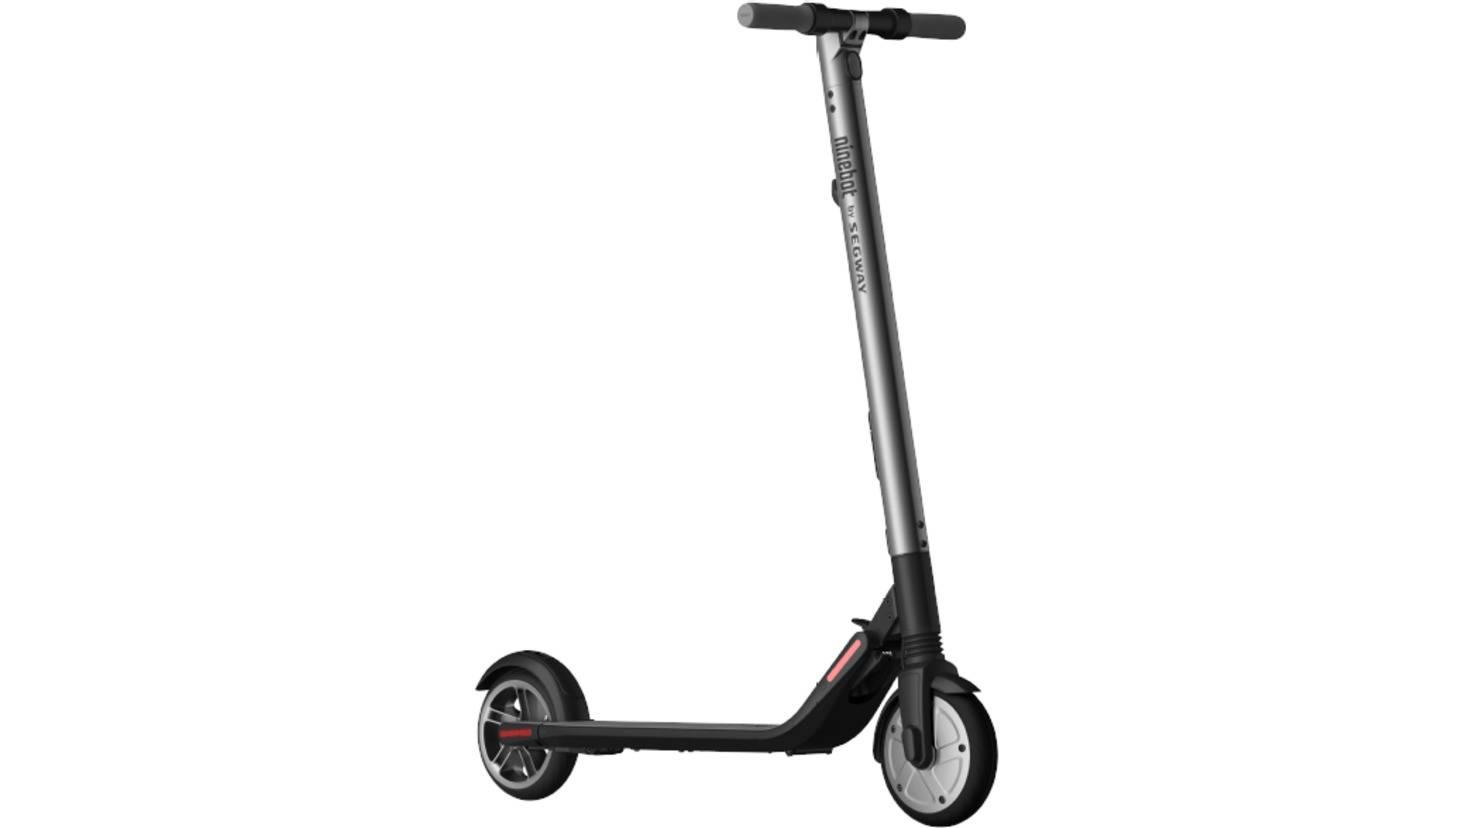 ninebot-kickscooter-es1-e-scooter